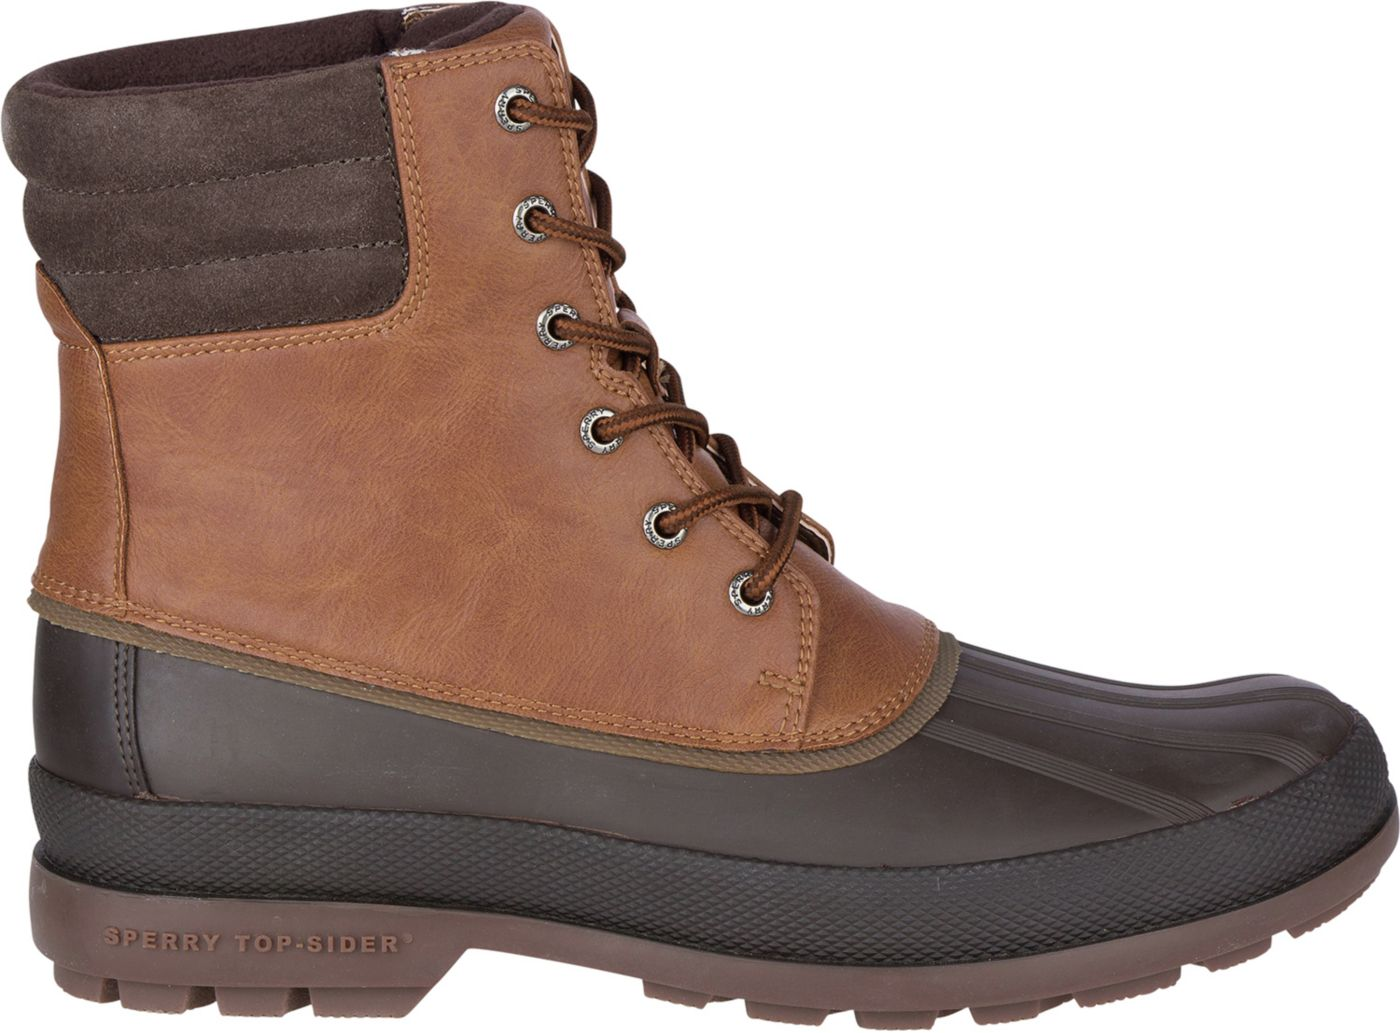 Sperry Men's Cold Bay 200g Waterproof Winter Boots